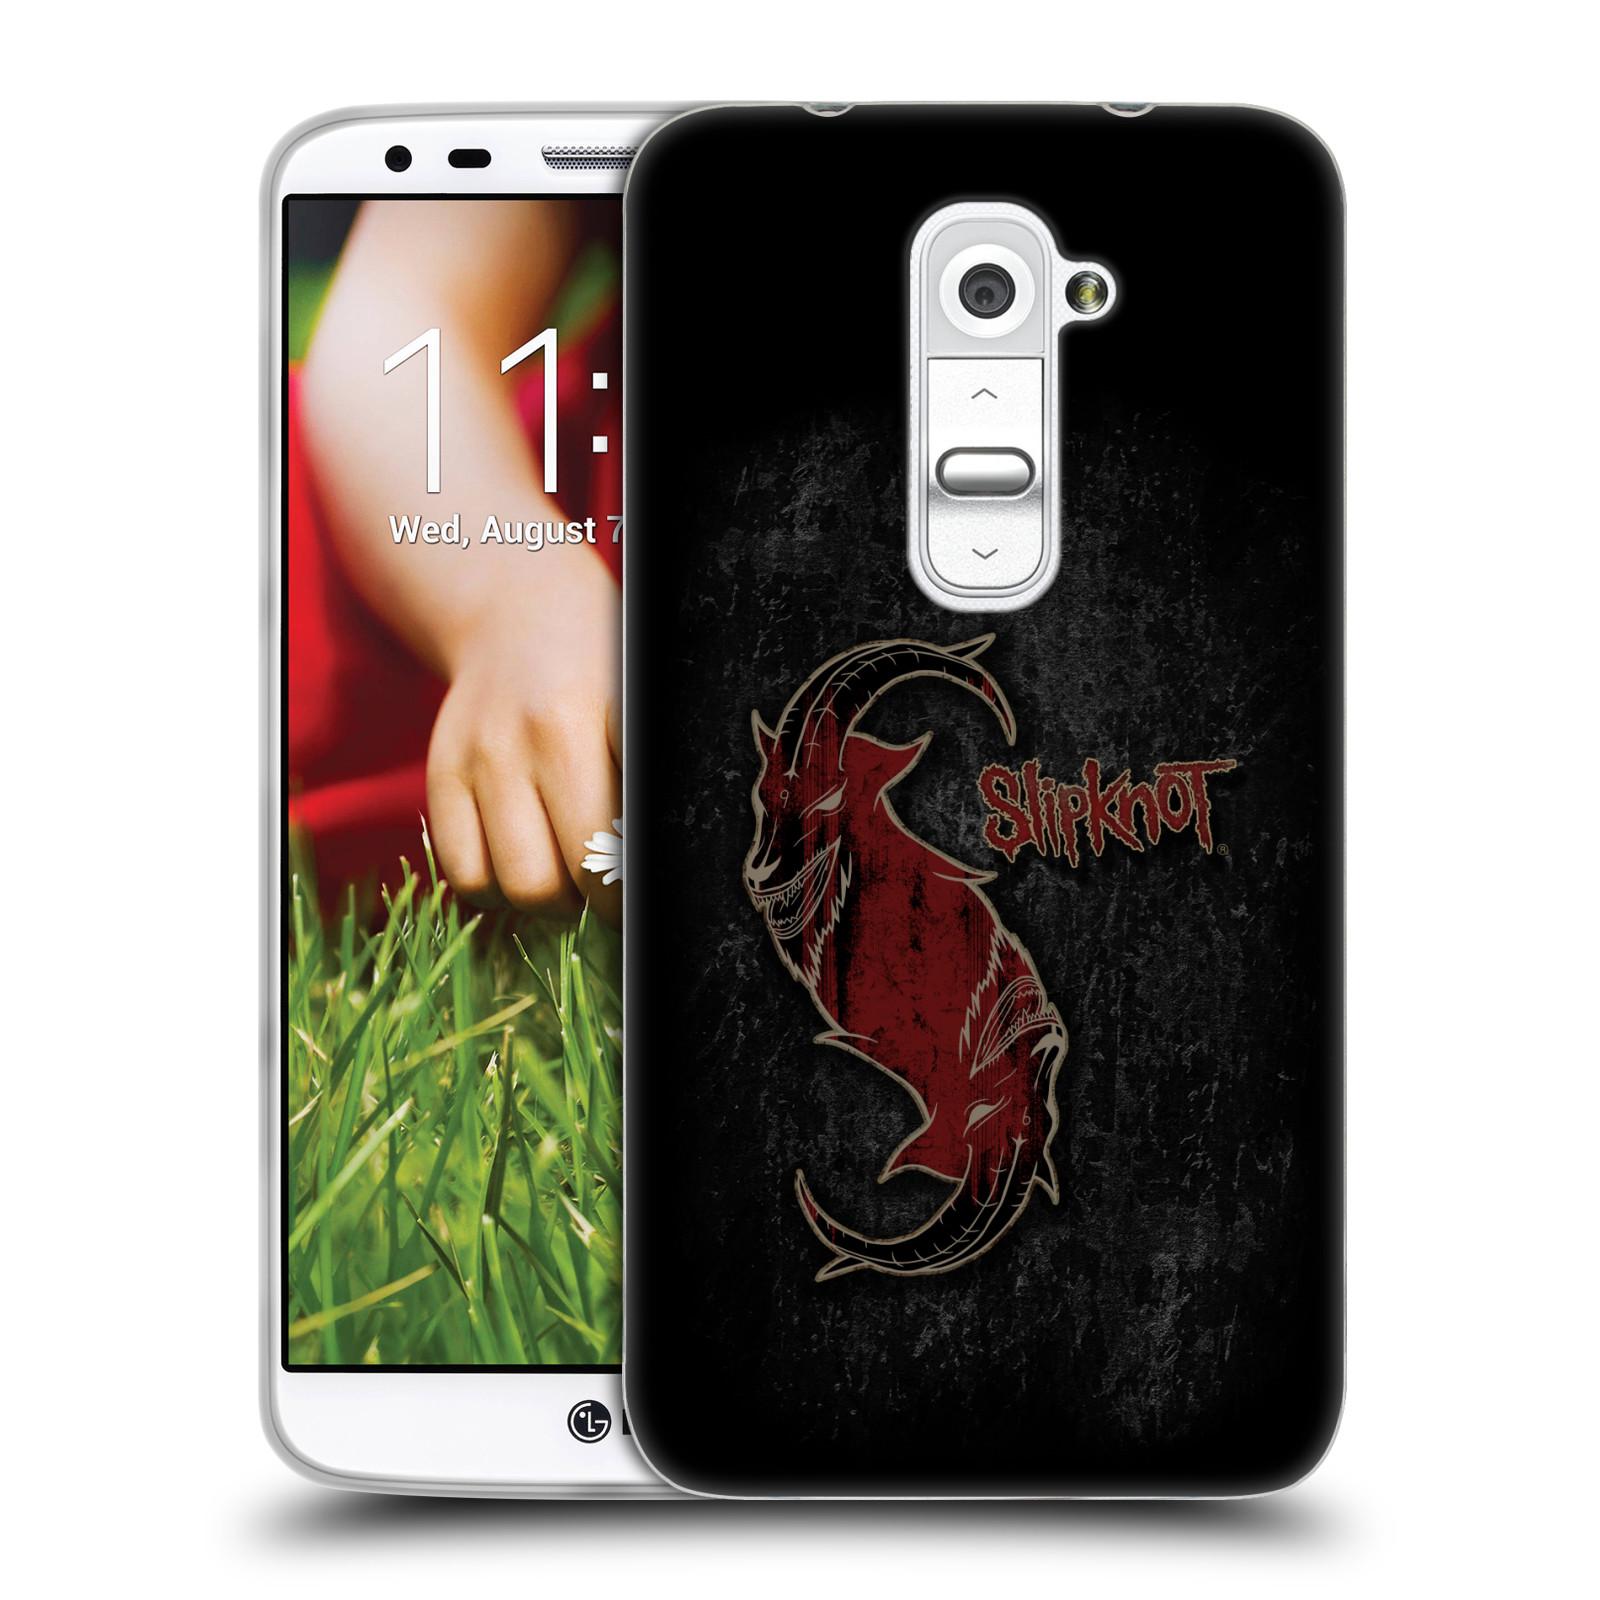 Silikonové pouzdro na mobil HTC LG G2 HEAD CASE Slipknot - Rudý kozel